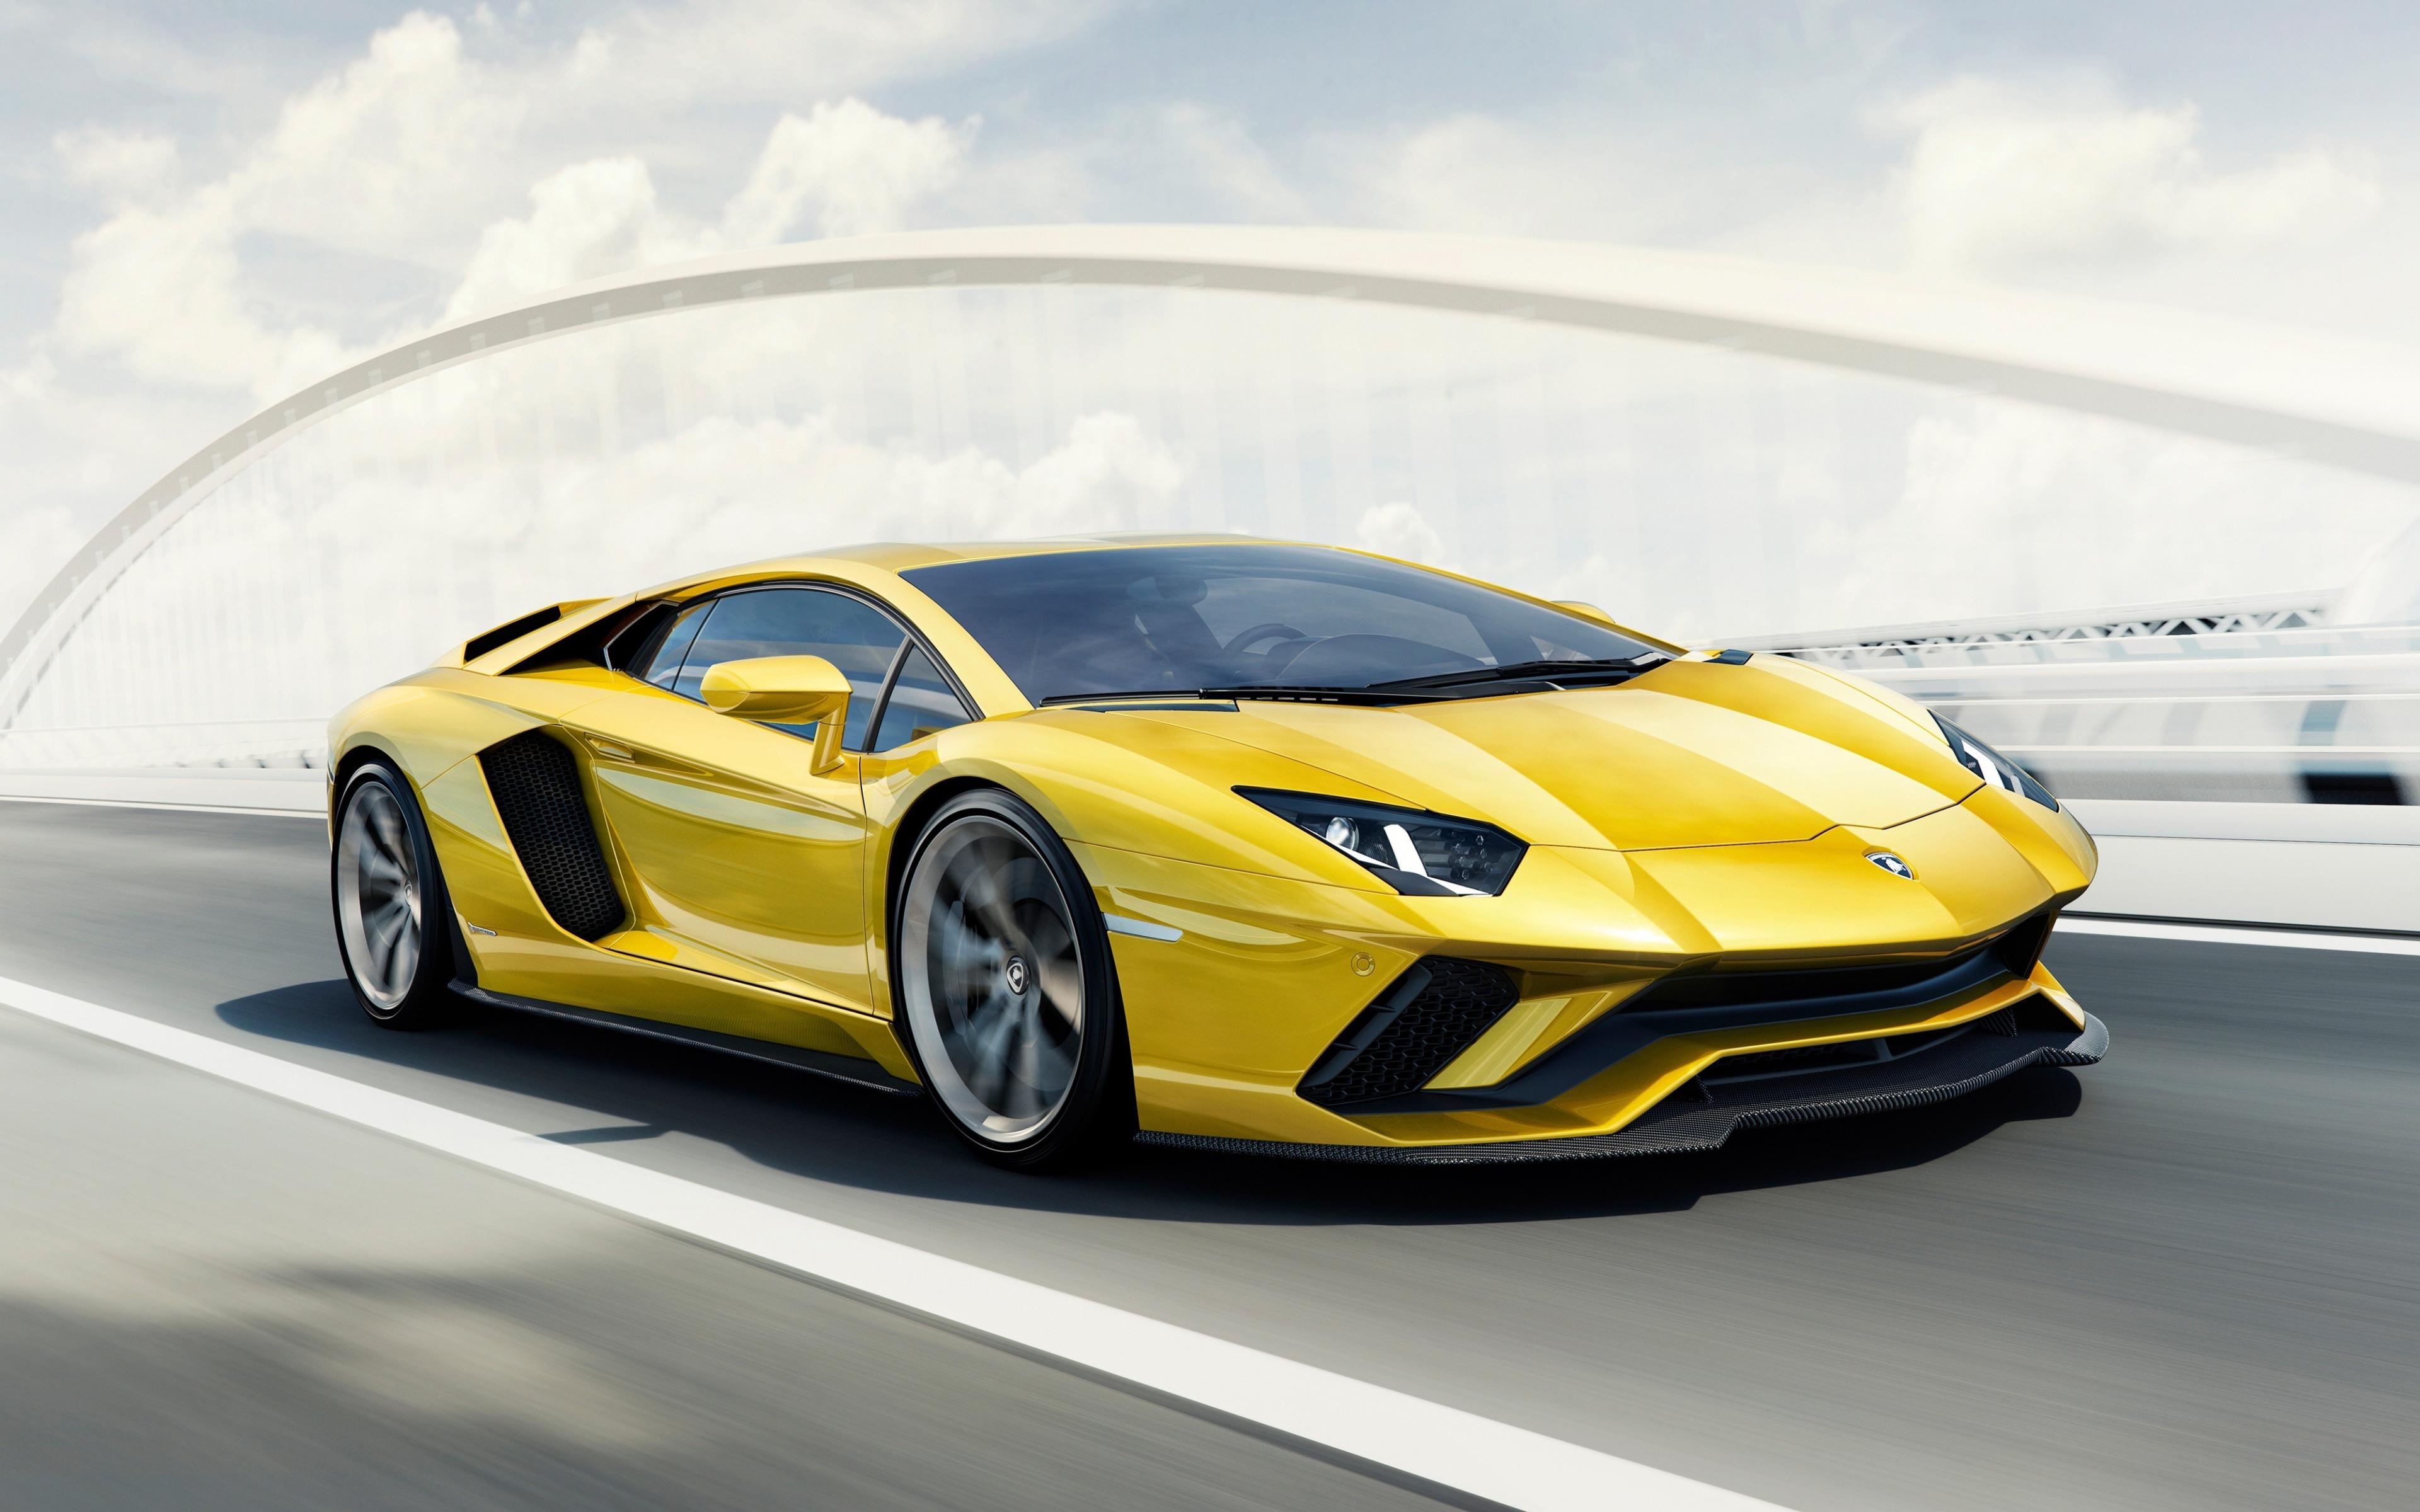 Download 3840x2400 Wallpaper Yellow Supercar Lamborghini Aventador 4k Ultra Hd 16 10 Widescreen 3840x2400 Hd Image Background 3491